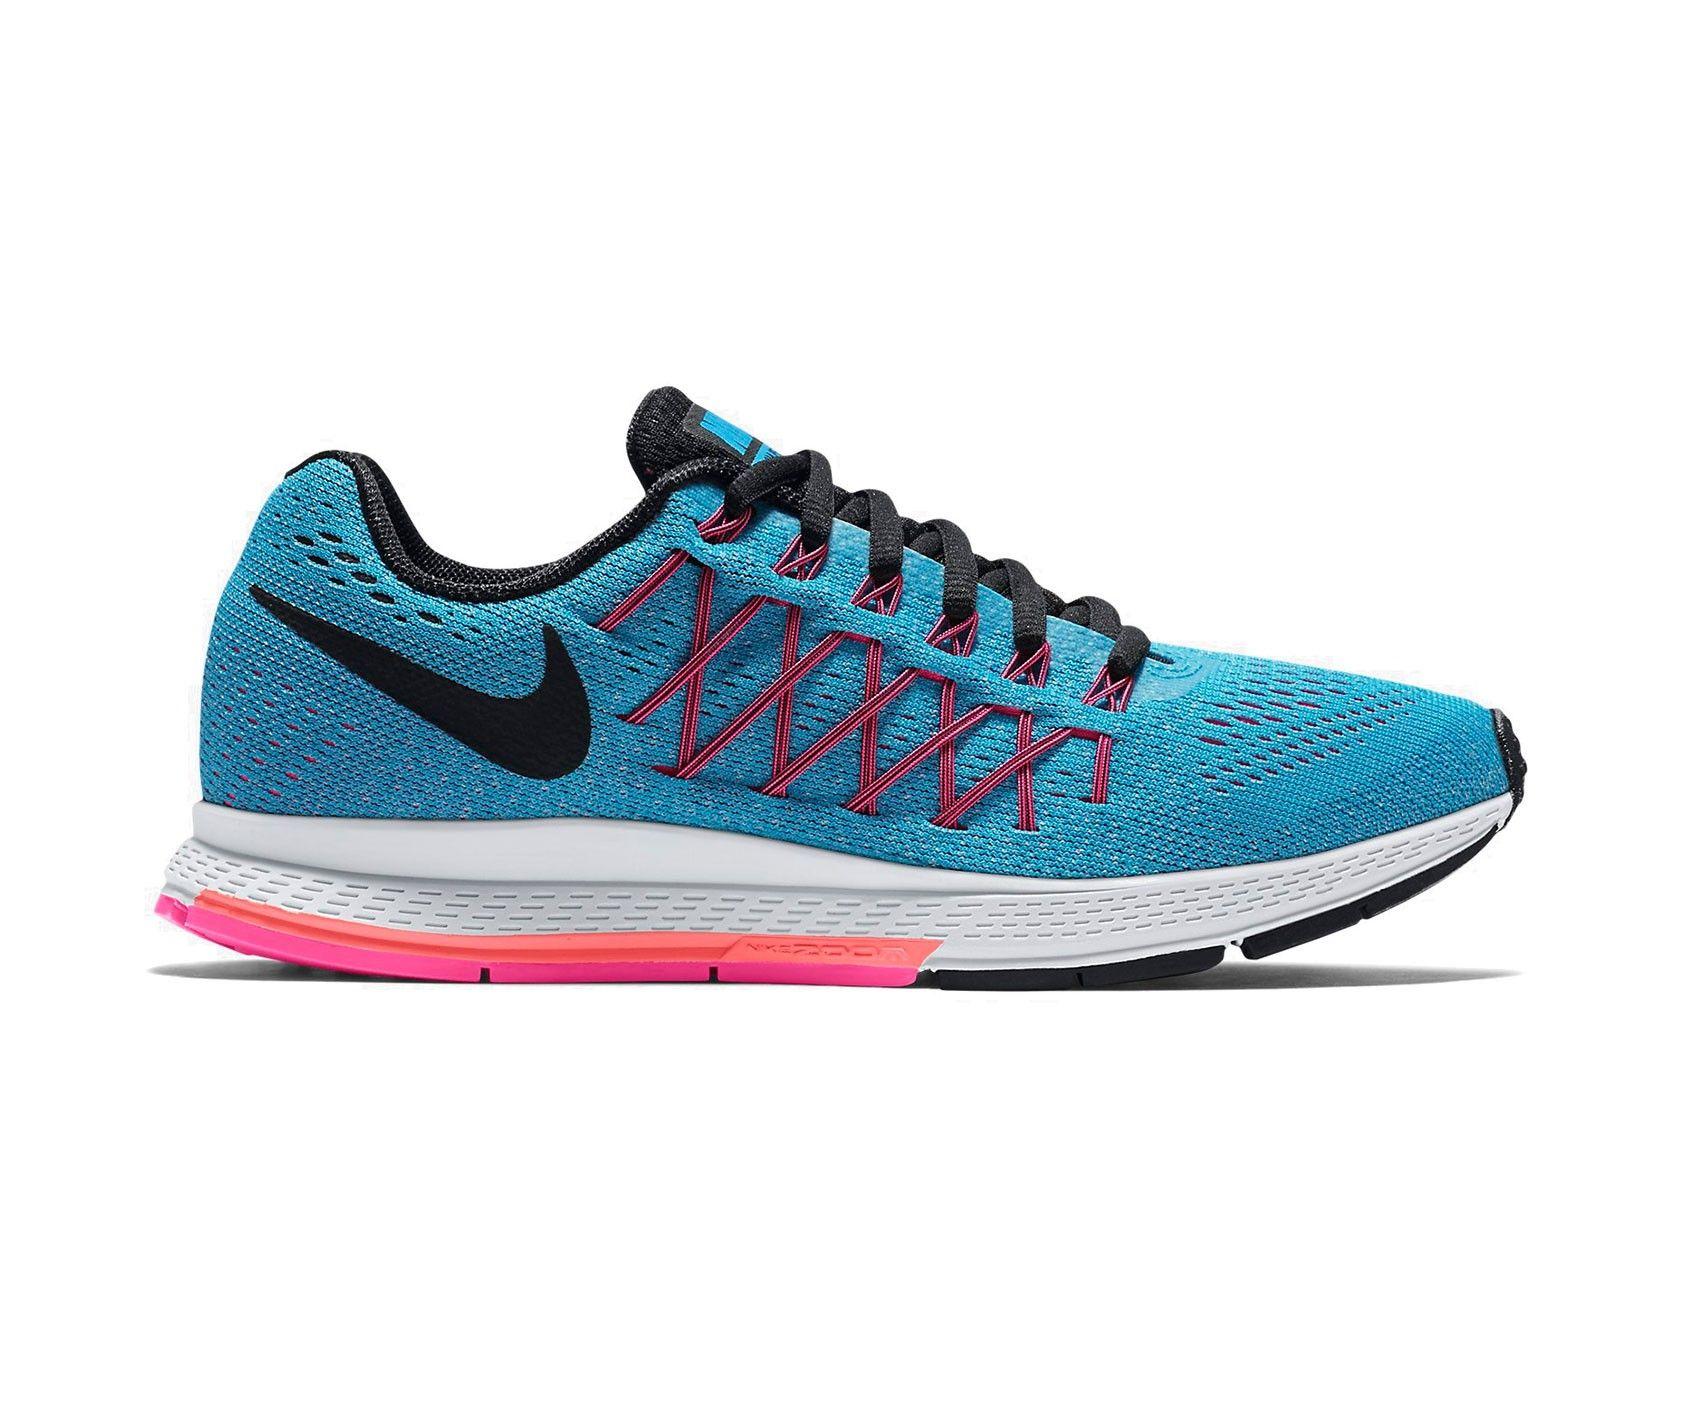 the best attitude fdc8d b7120 NIKE AIR ZOOM PEGASUS 32 AZULNEGRO MUJER Running Nike, Running Shoes, Nike